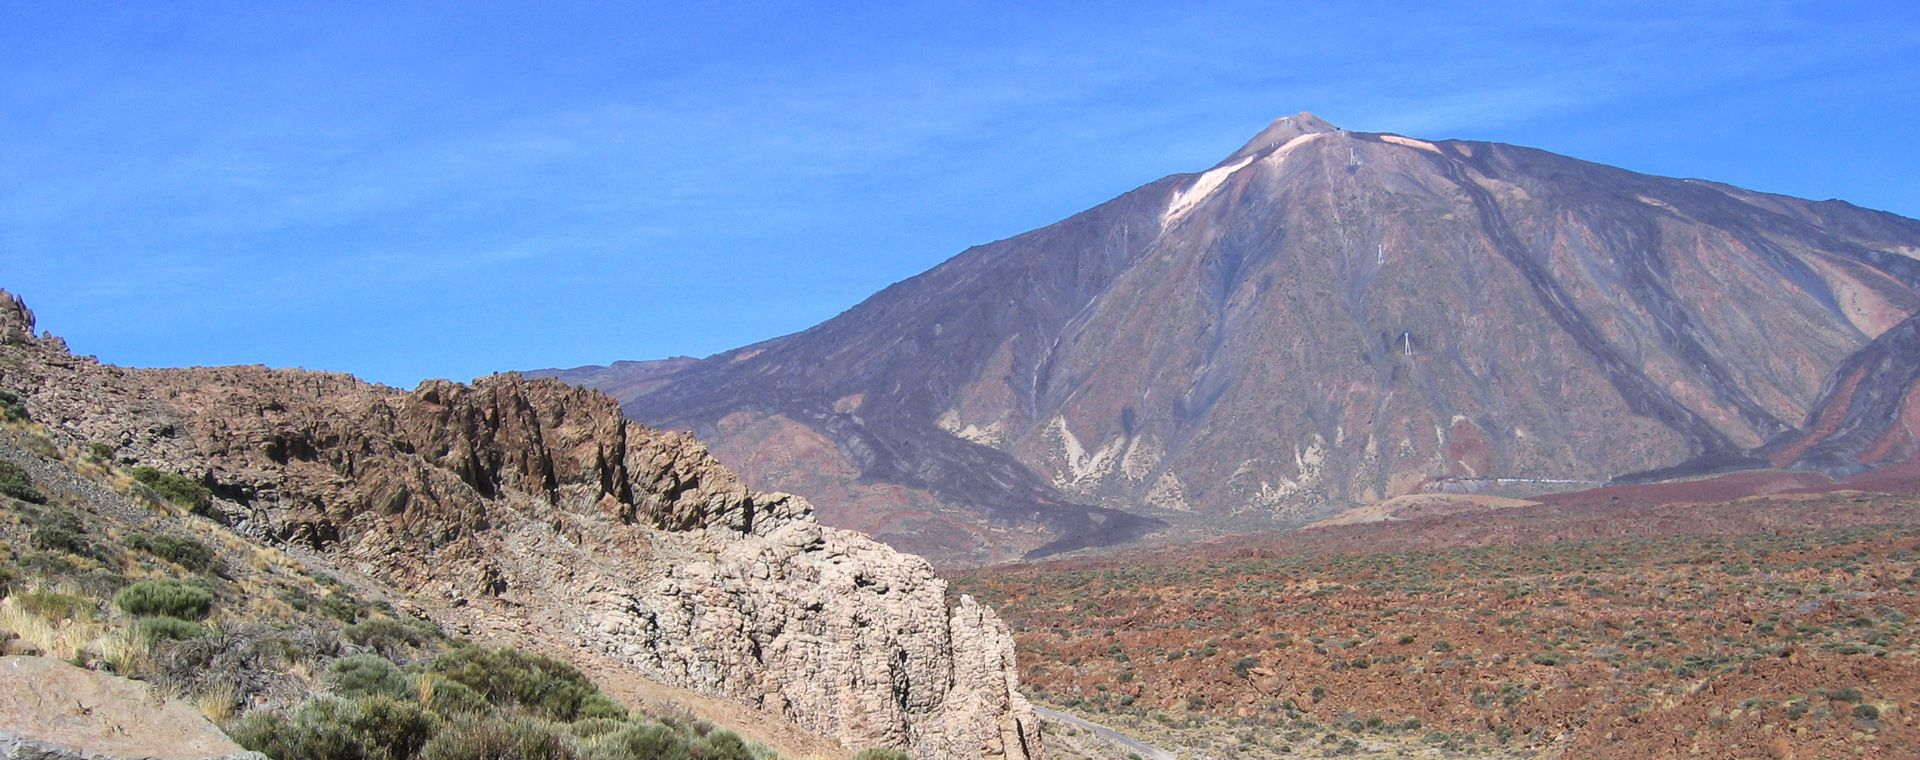 Image Îles Canaries : Tenerife